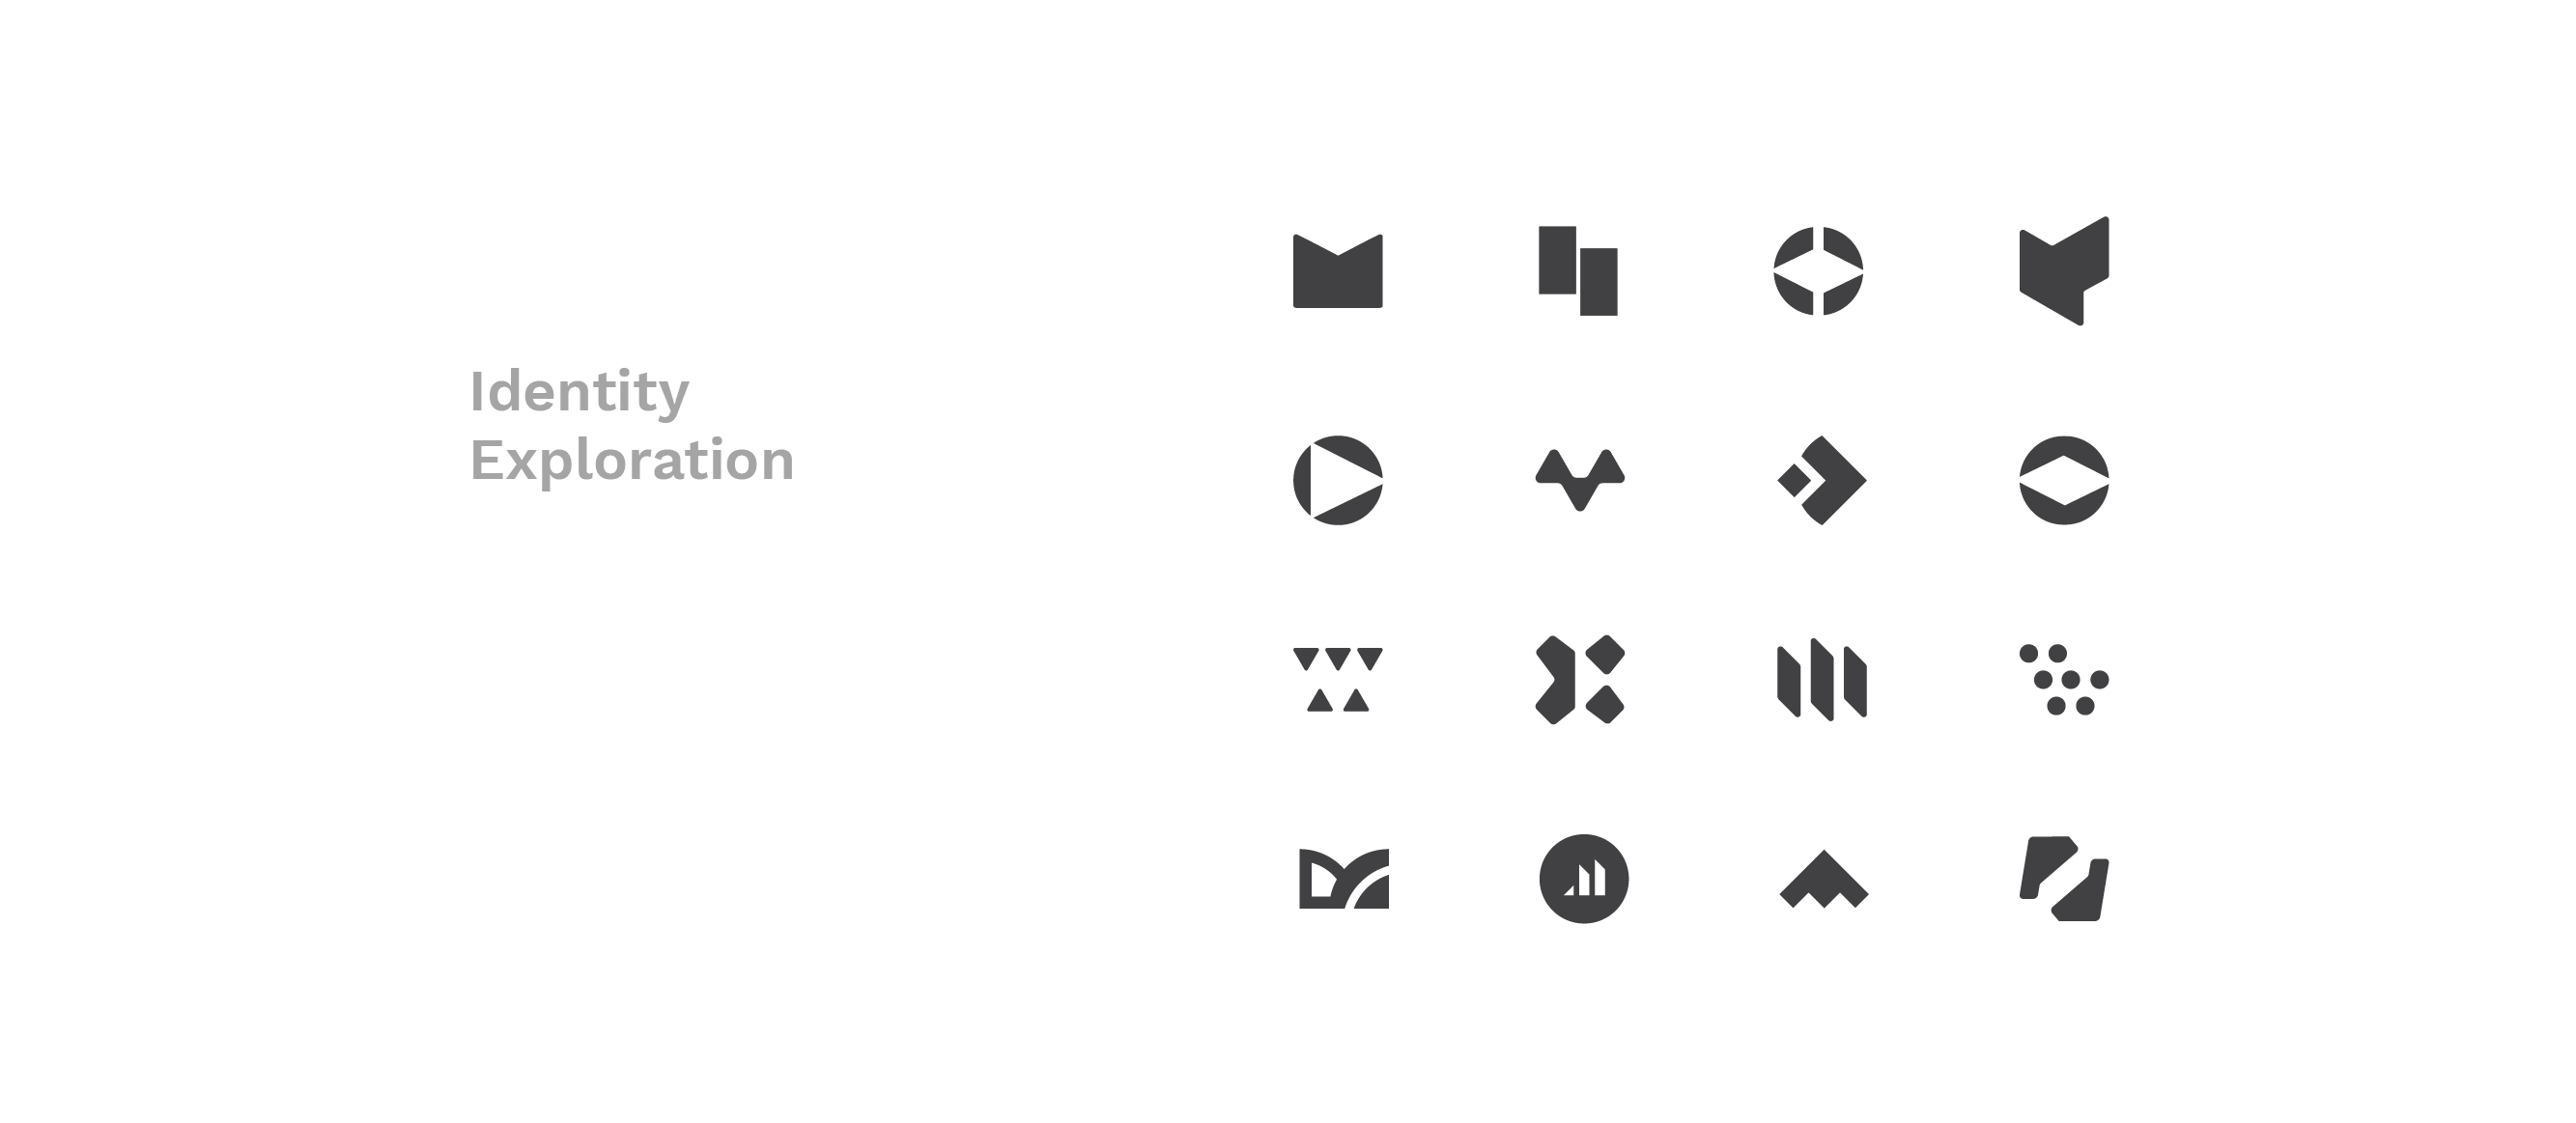 marketron-logo-exploration-05